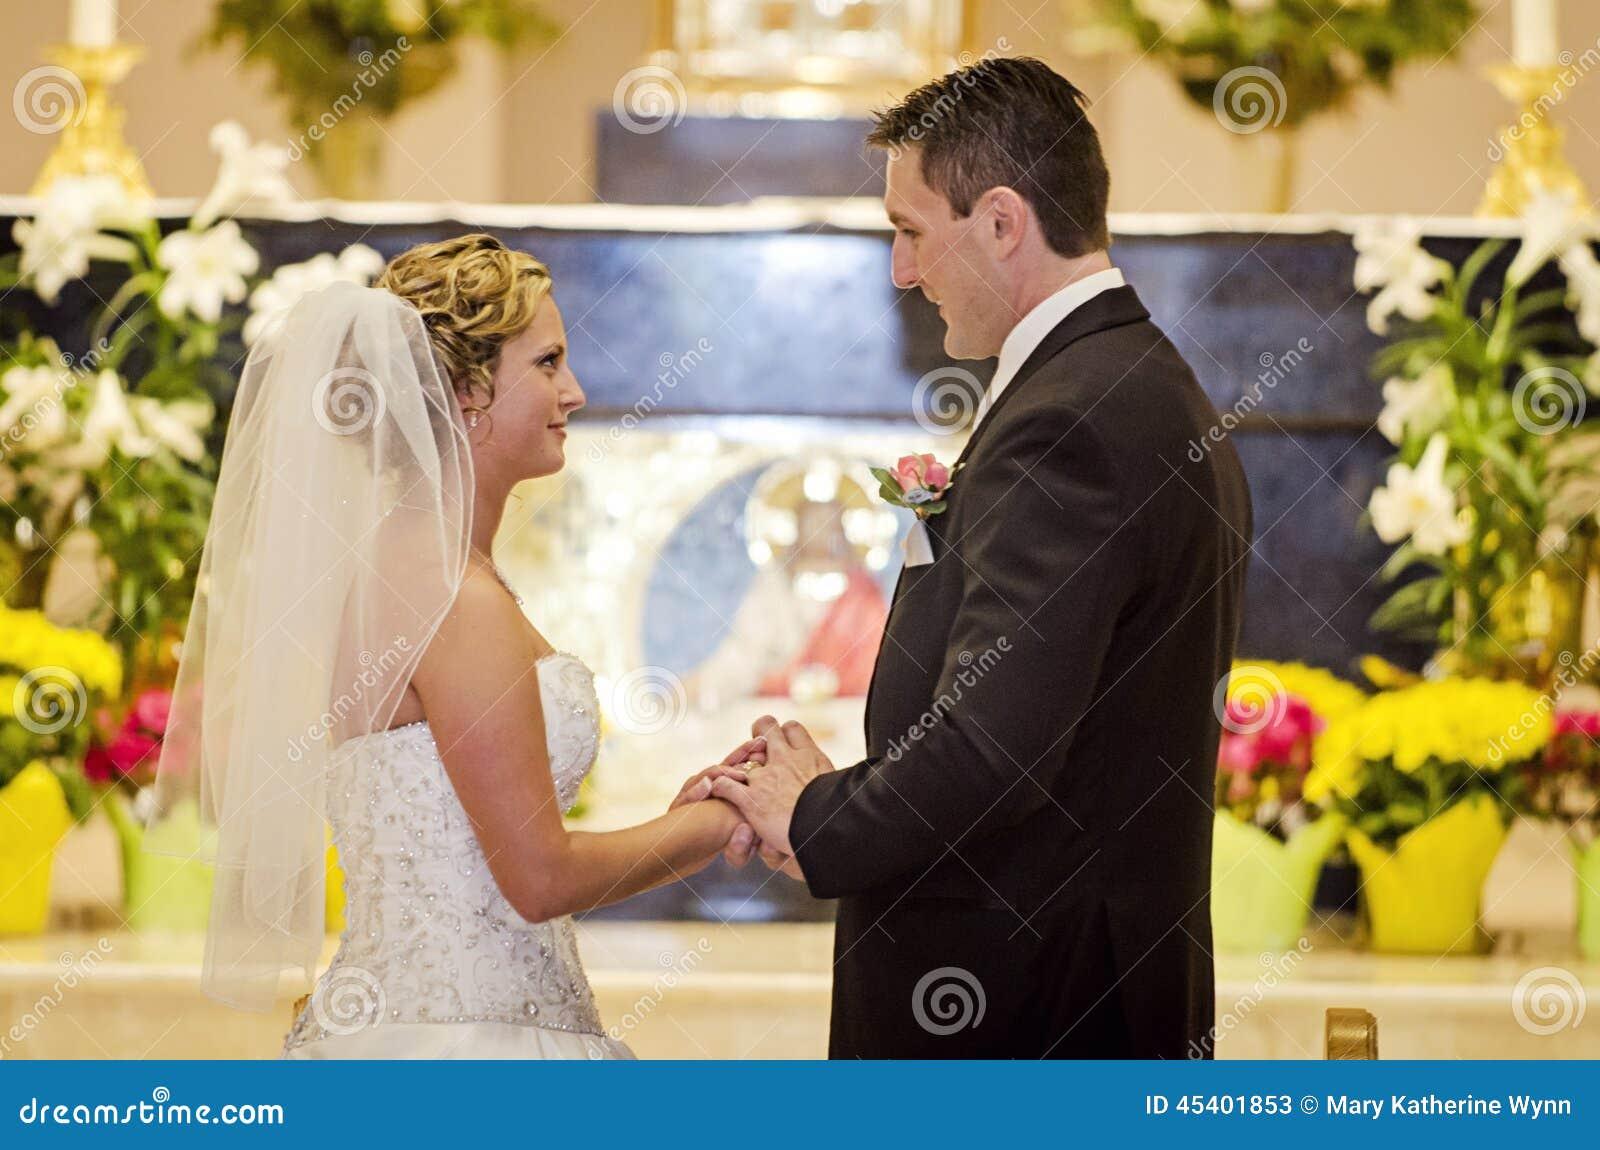 Wedding oath of the bride and groom 39